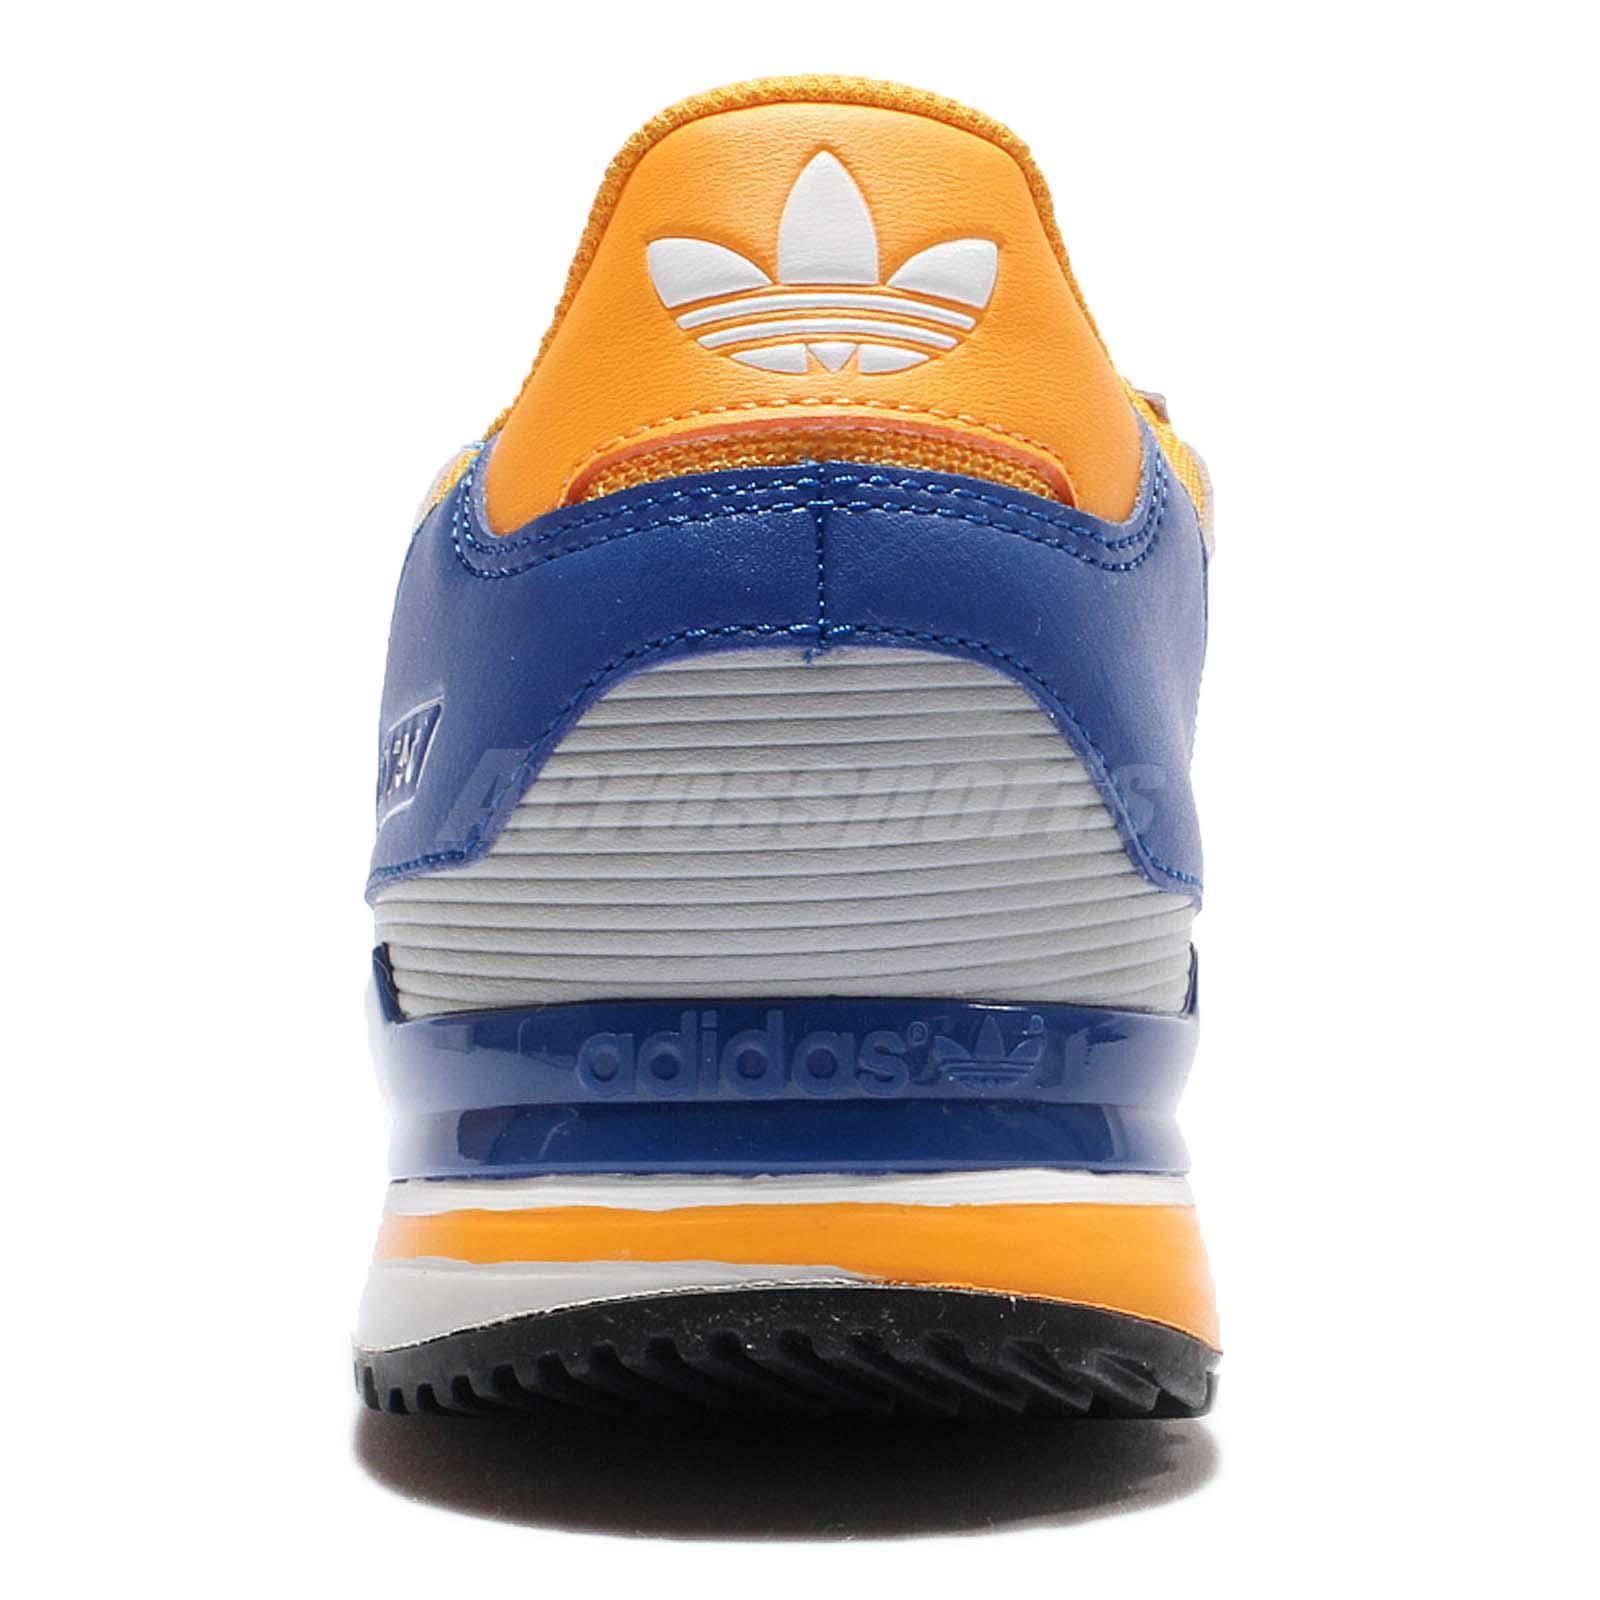 adidas zx 750 unisex yellow